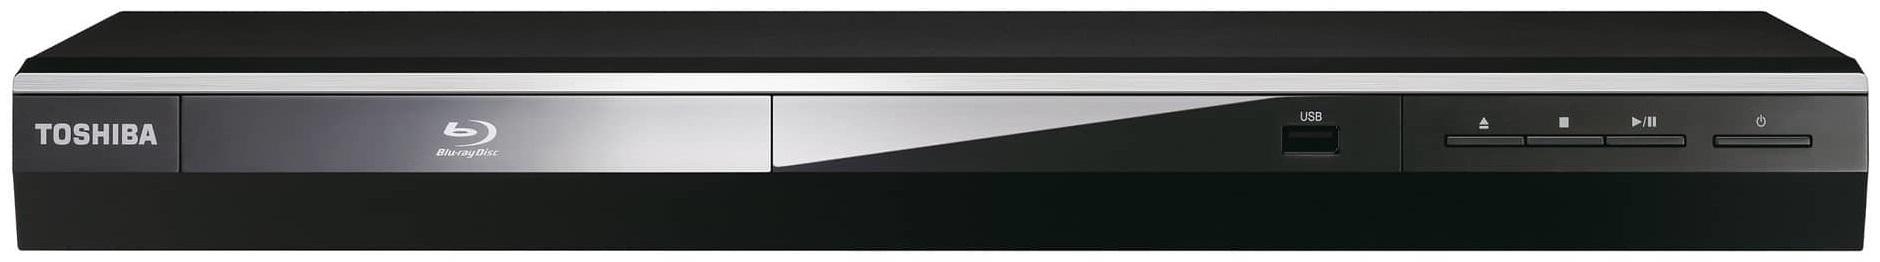 Toshiba BDX1200 multi-region Blu-ray player